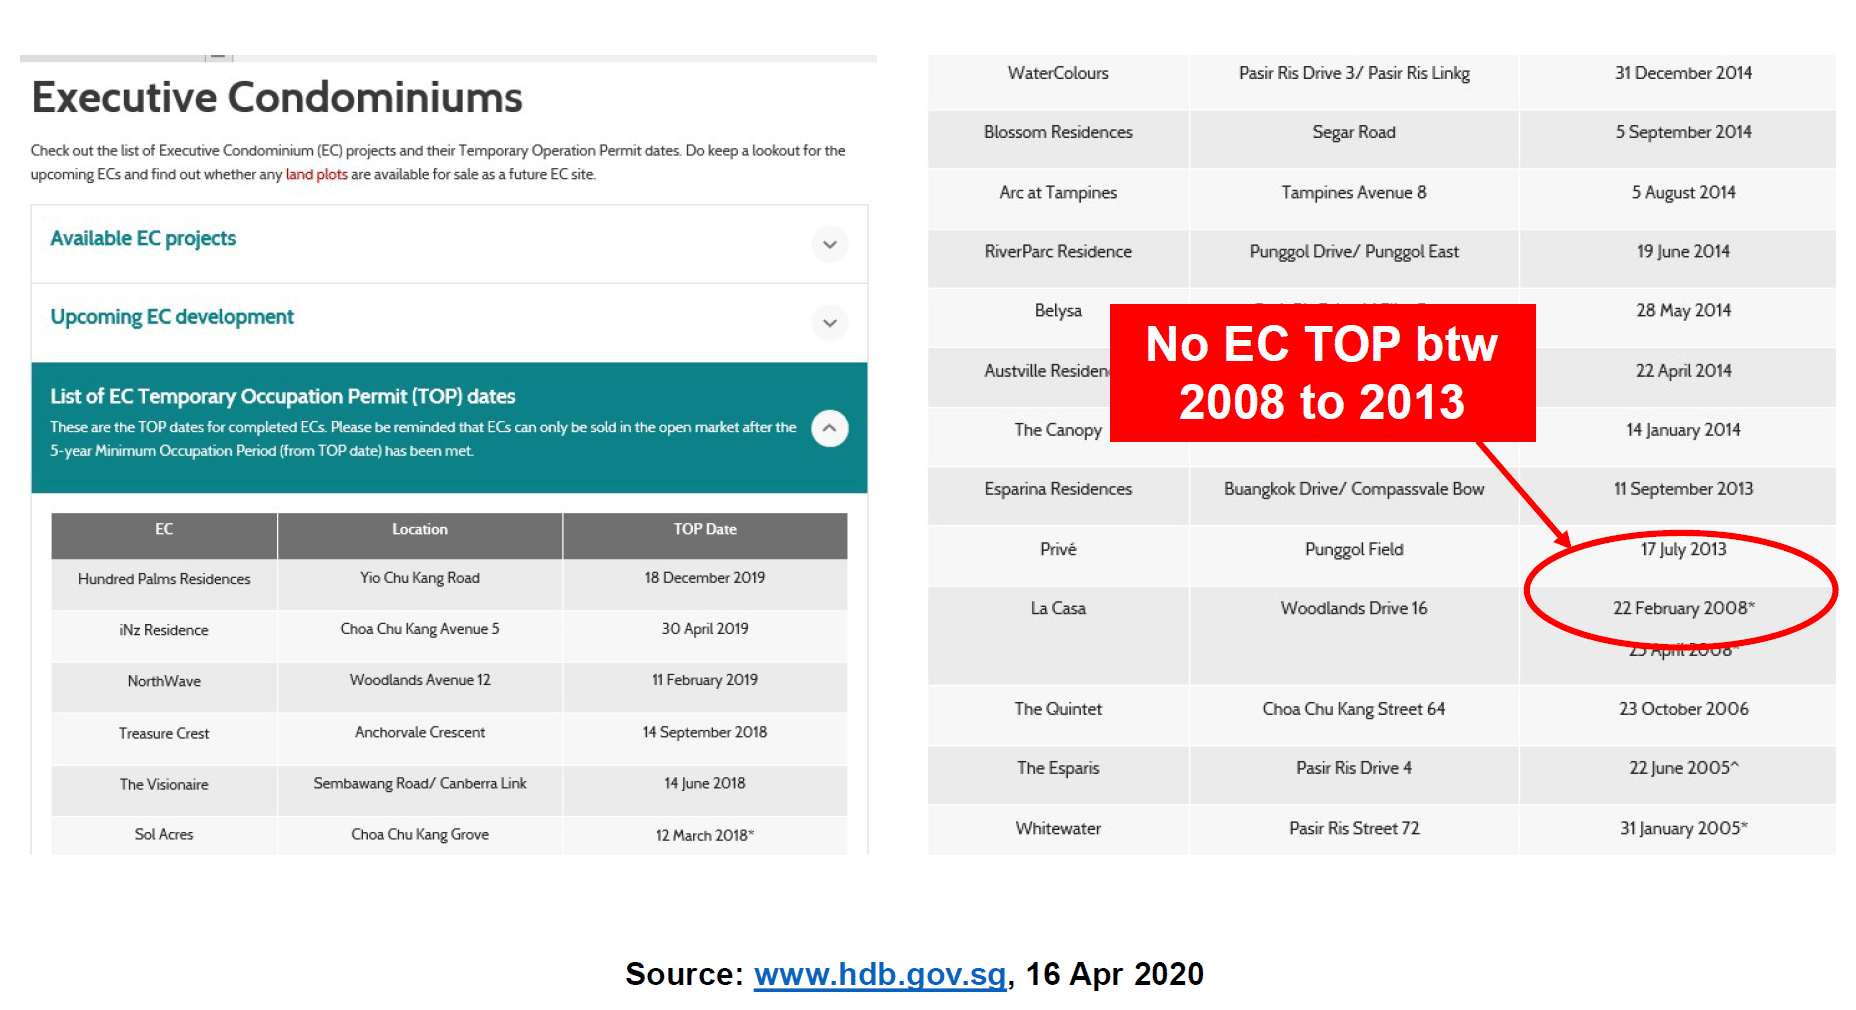 No EC TOP between 2008 and 2013